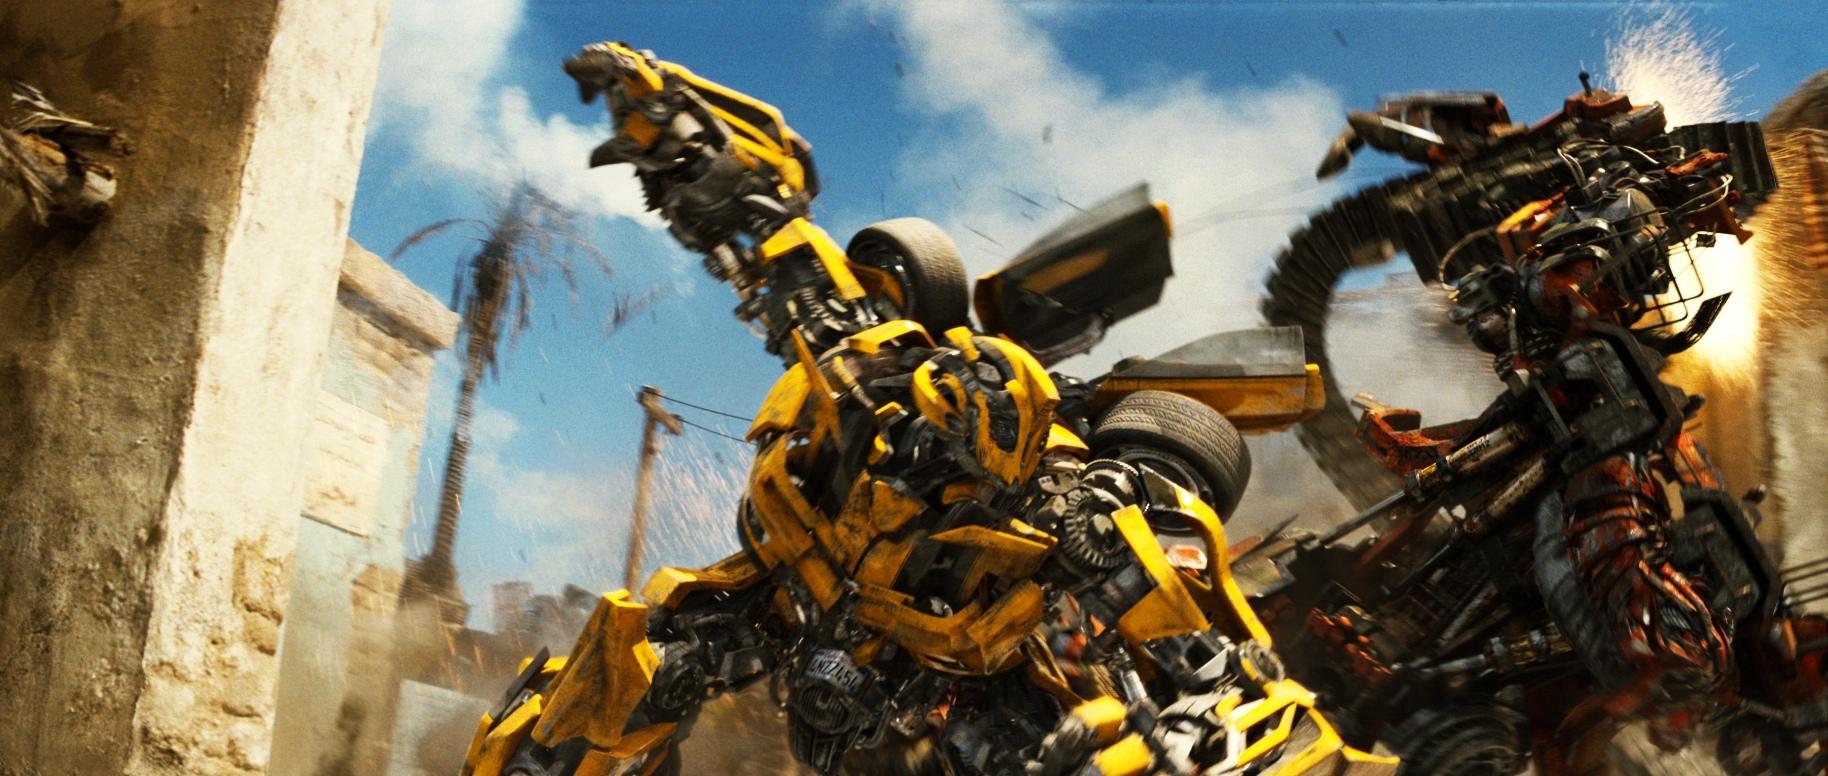 http://media.kino-govno.com/images/transformers2/transformers2_34.jpg